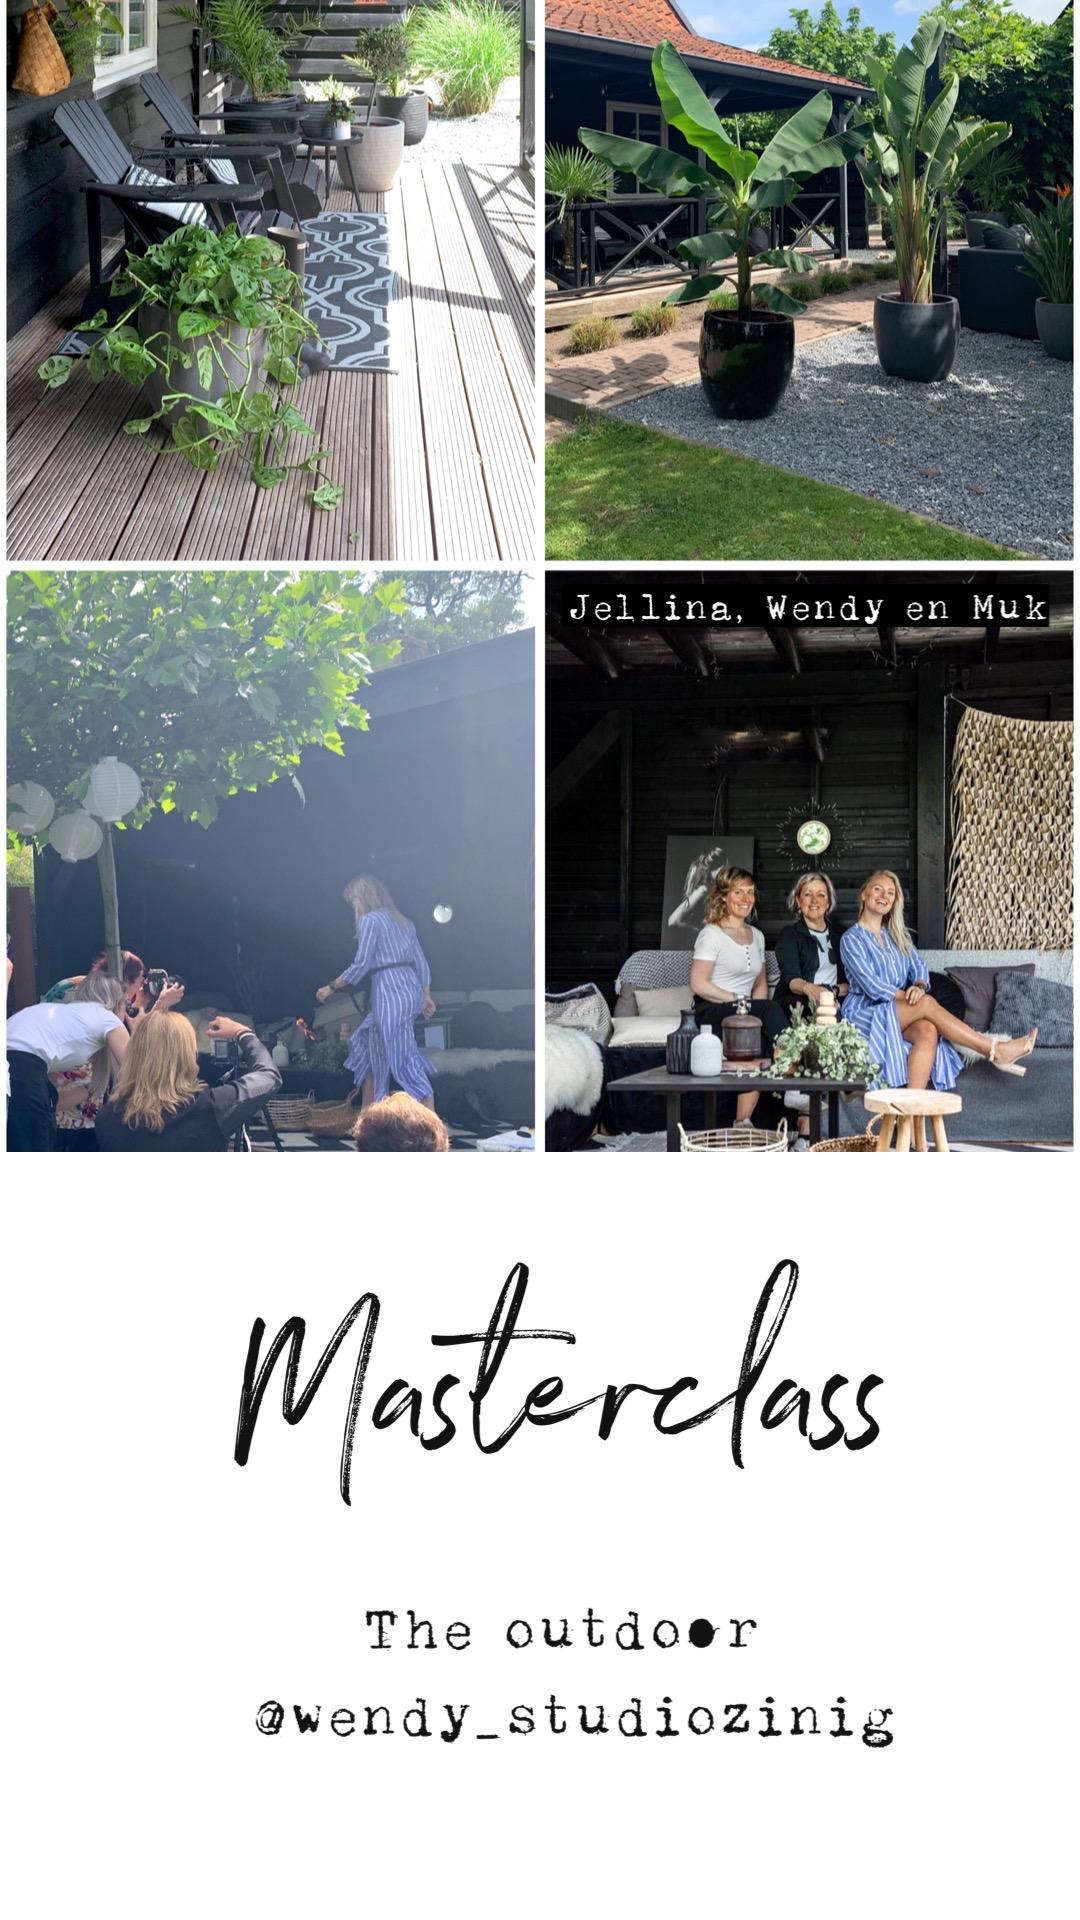 Masterclass outdoor @wendy_studiozinnig